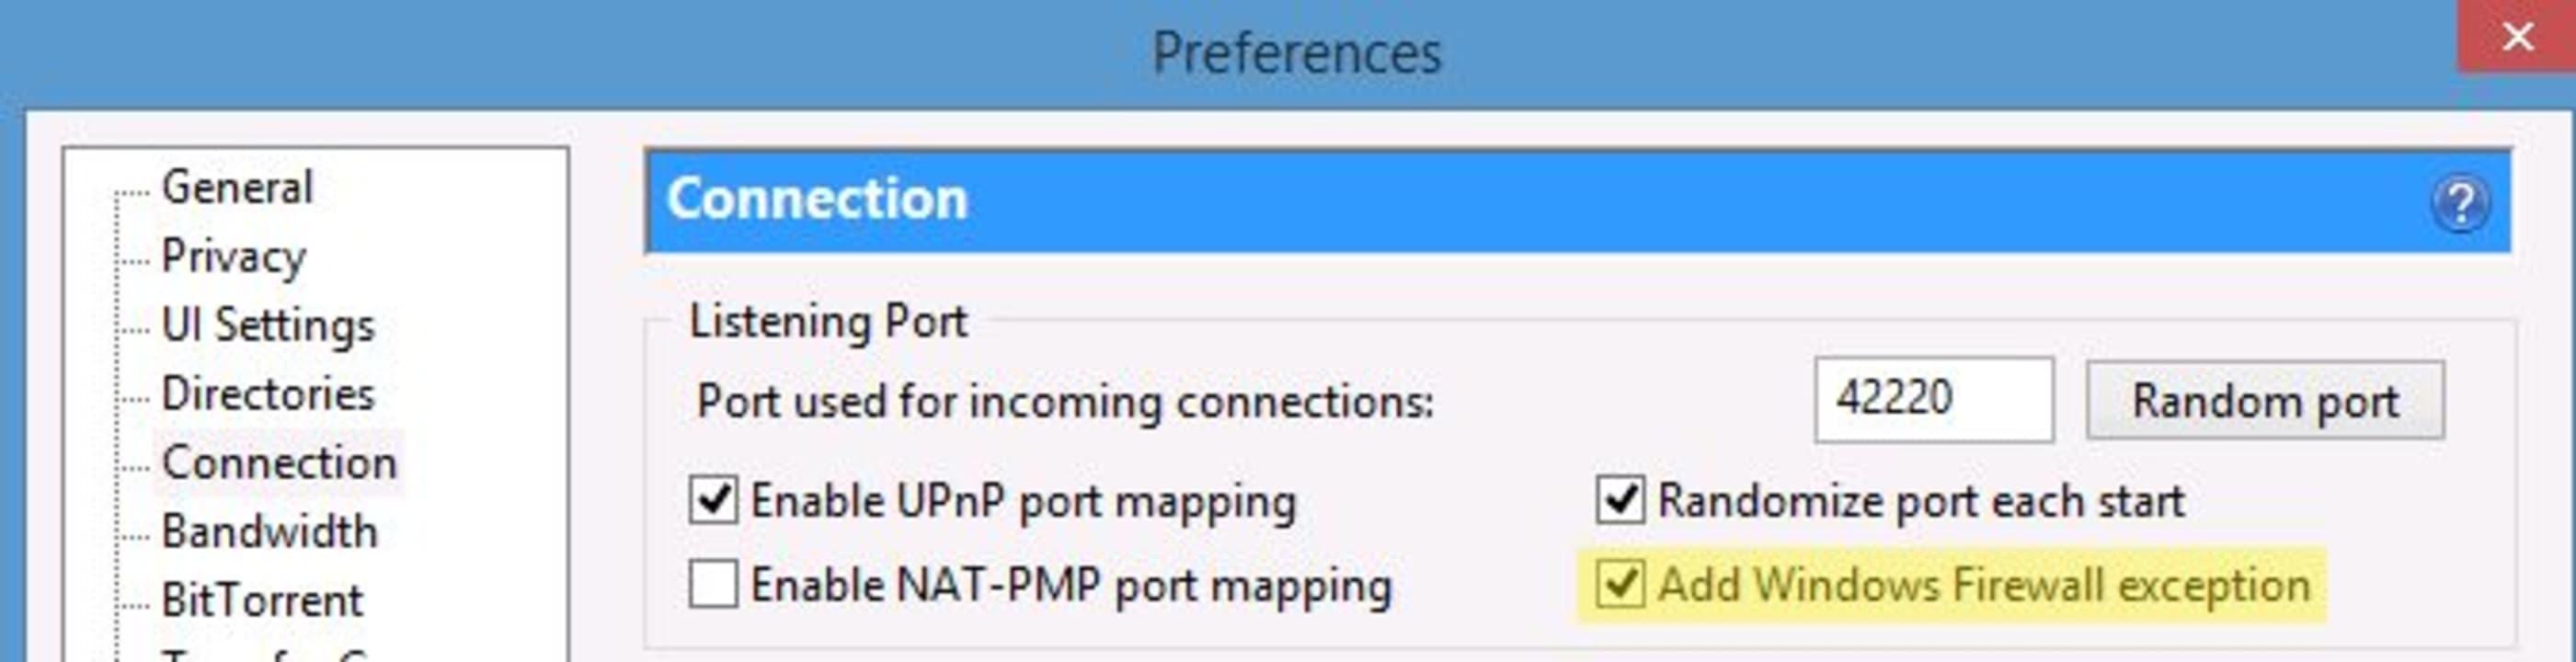 How to Fix uTorrent Connection Error 10047